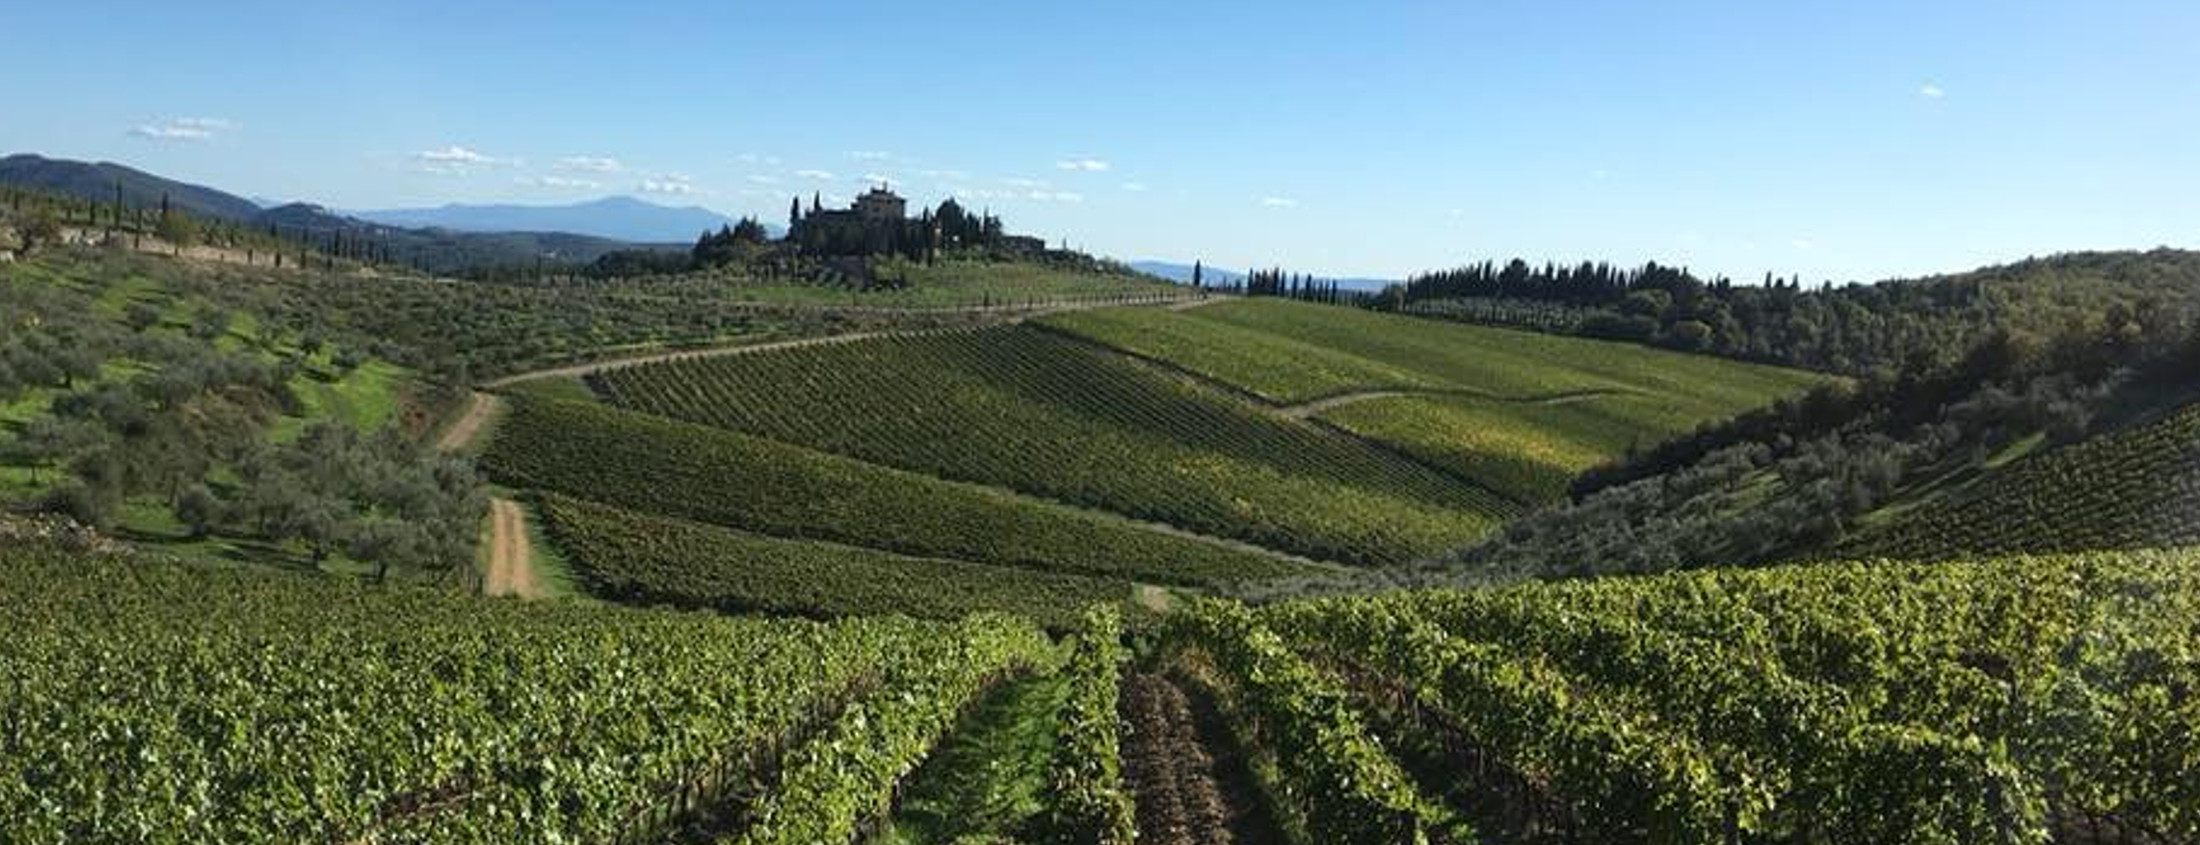 Country Wine | vineyards